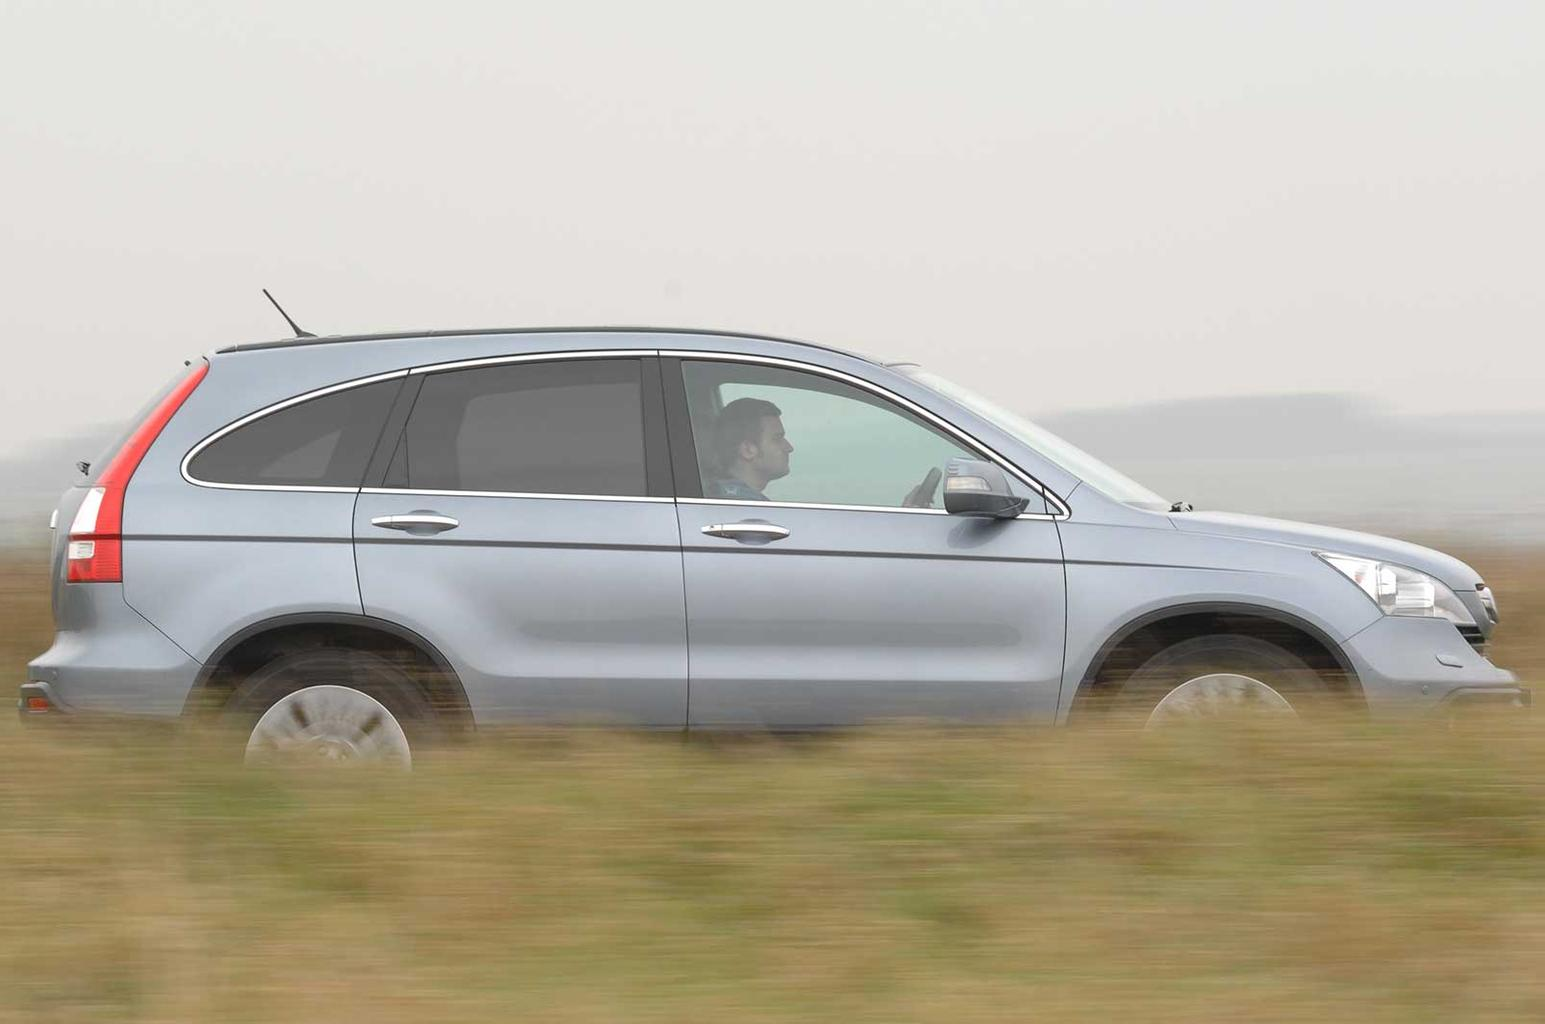 Used car of the week: Honda CR-V